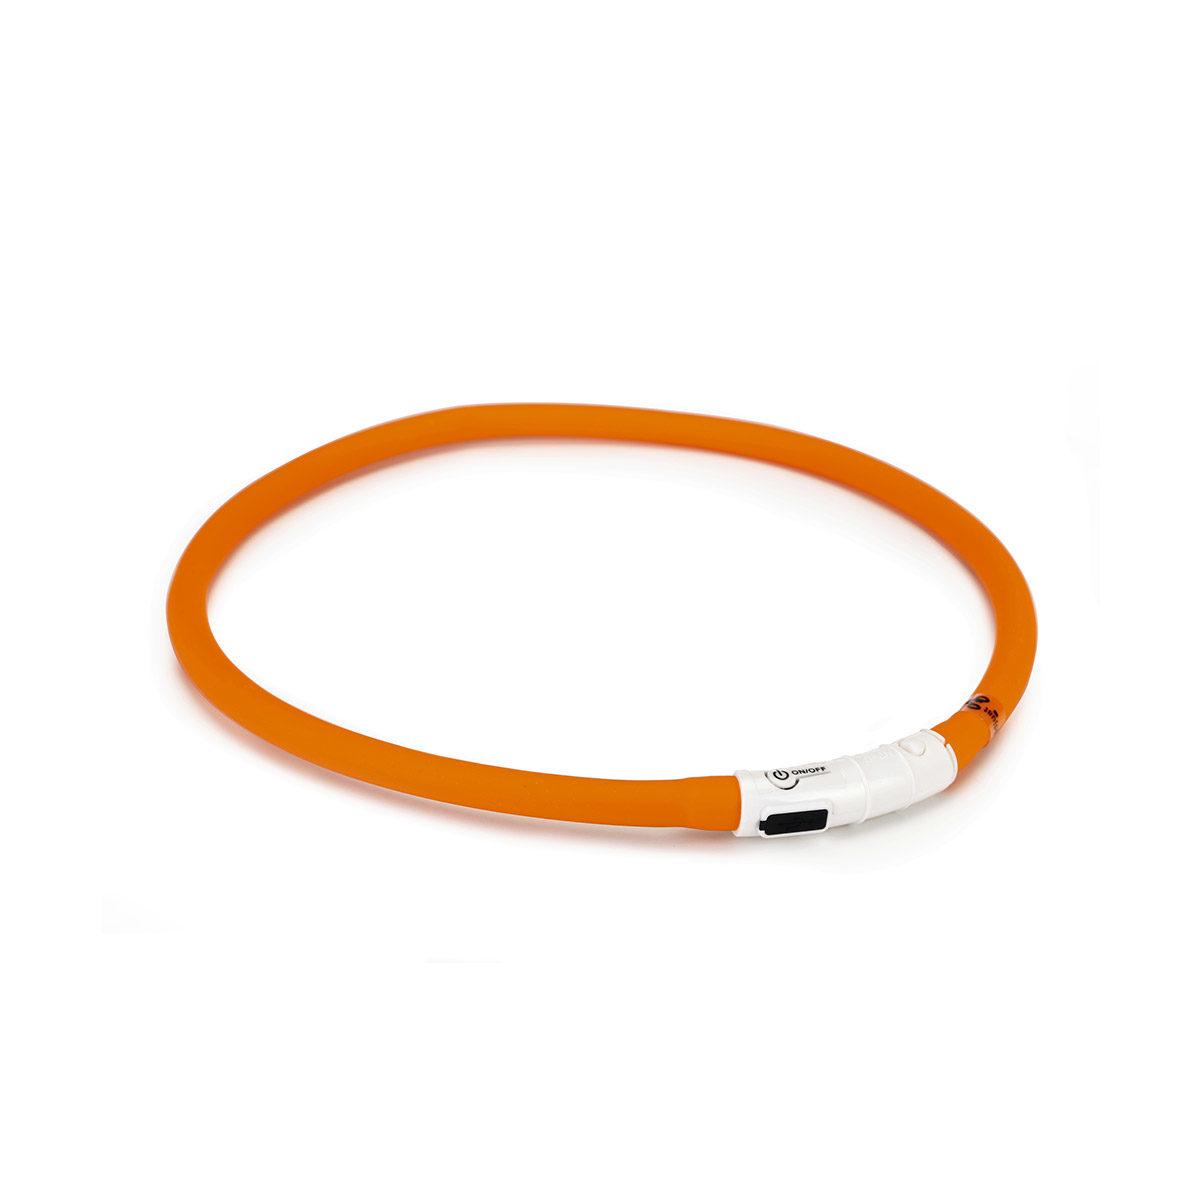 Beeztees LED Lichtgevende Veiligheidshalsband siliconen 70 cm x 10 mm Oranje